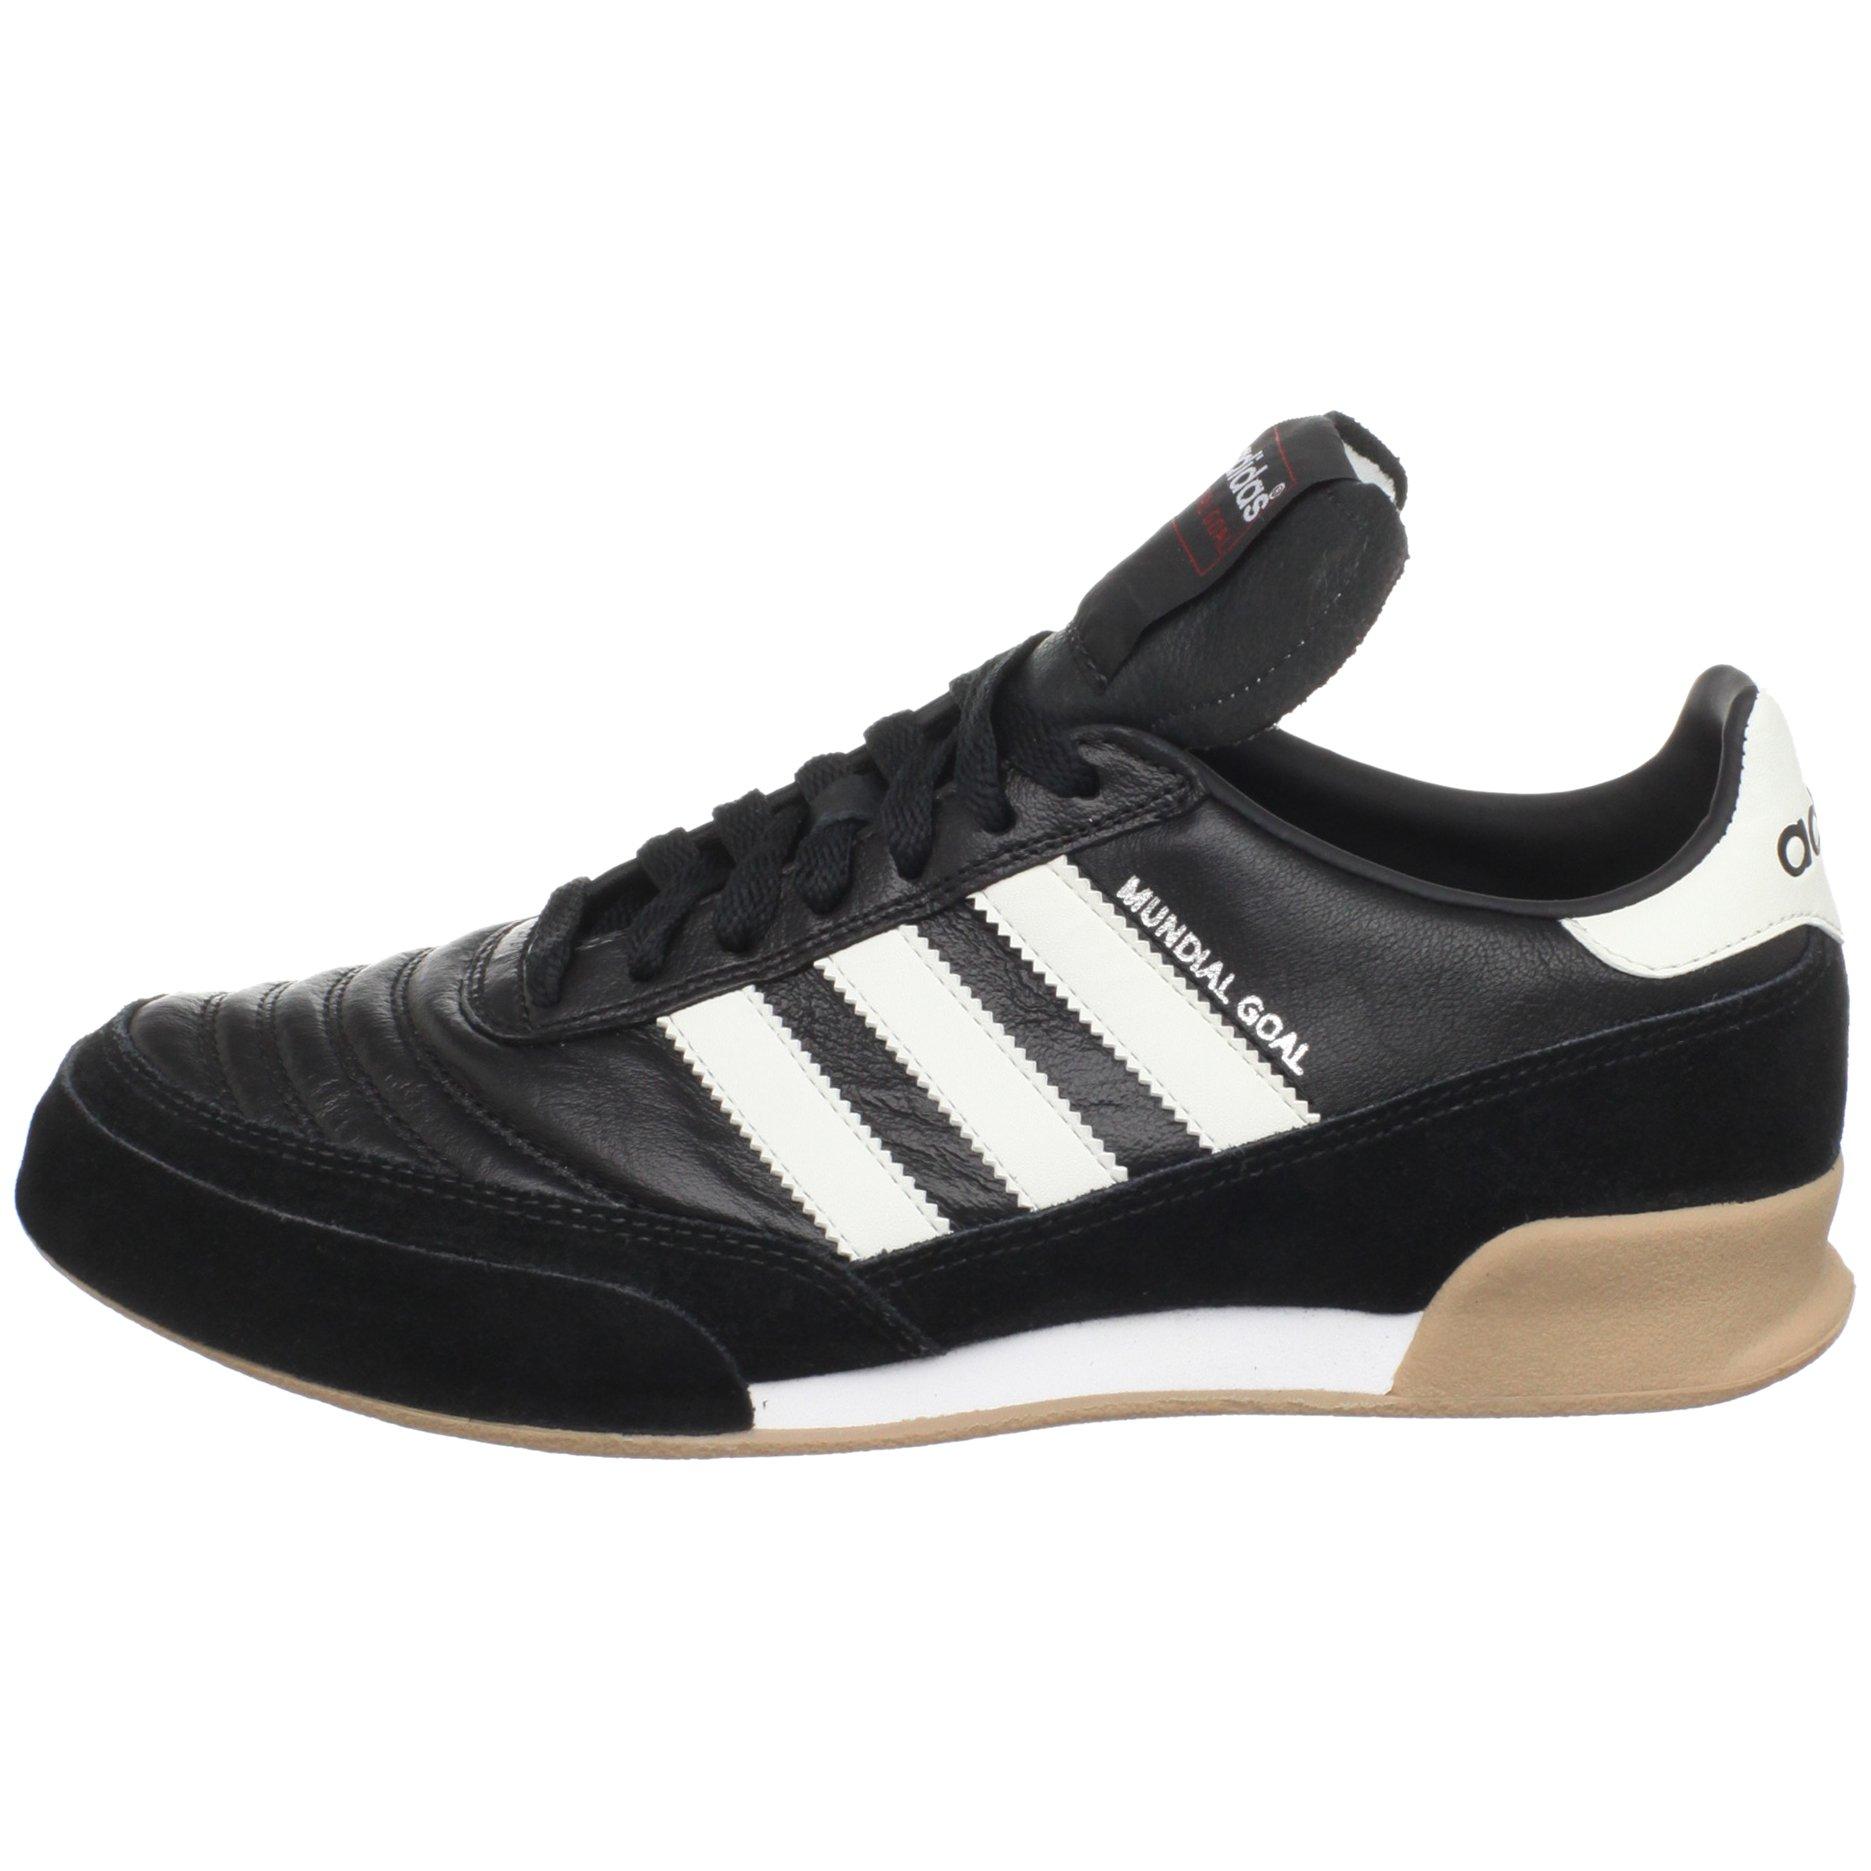 adidas Men's Mundial Goal Soccer Cleat, Black/White/White, 5 M US by adidas (Image #5)